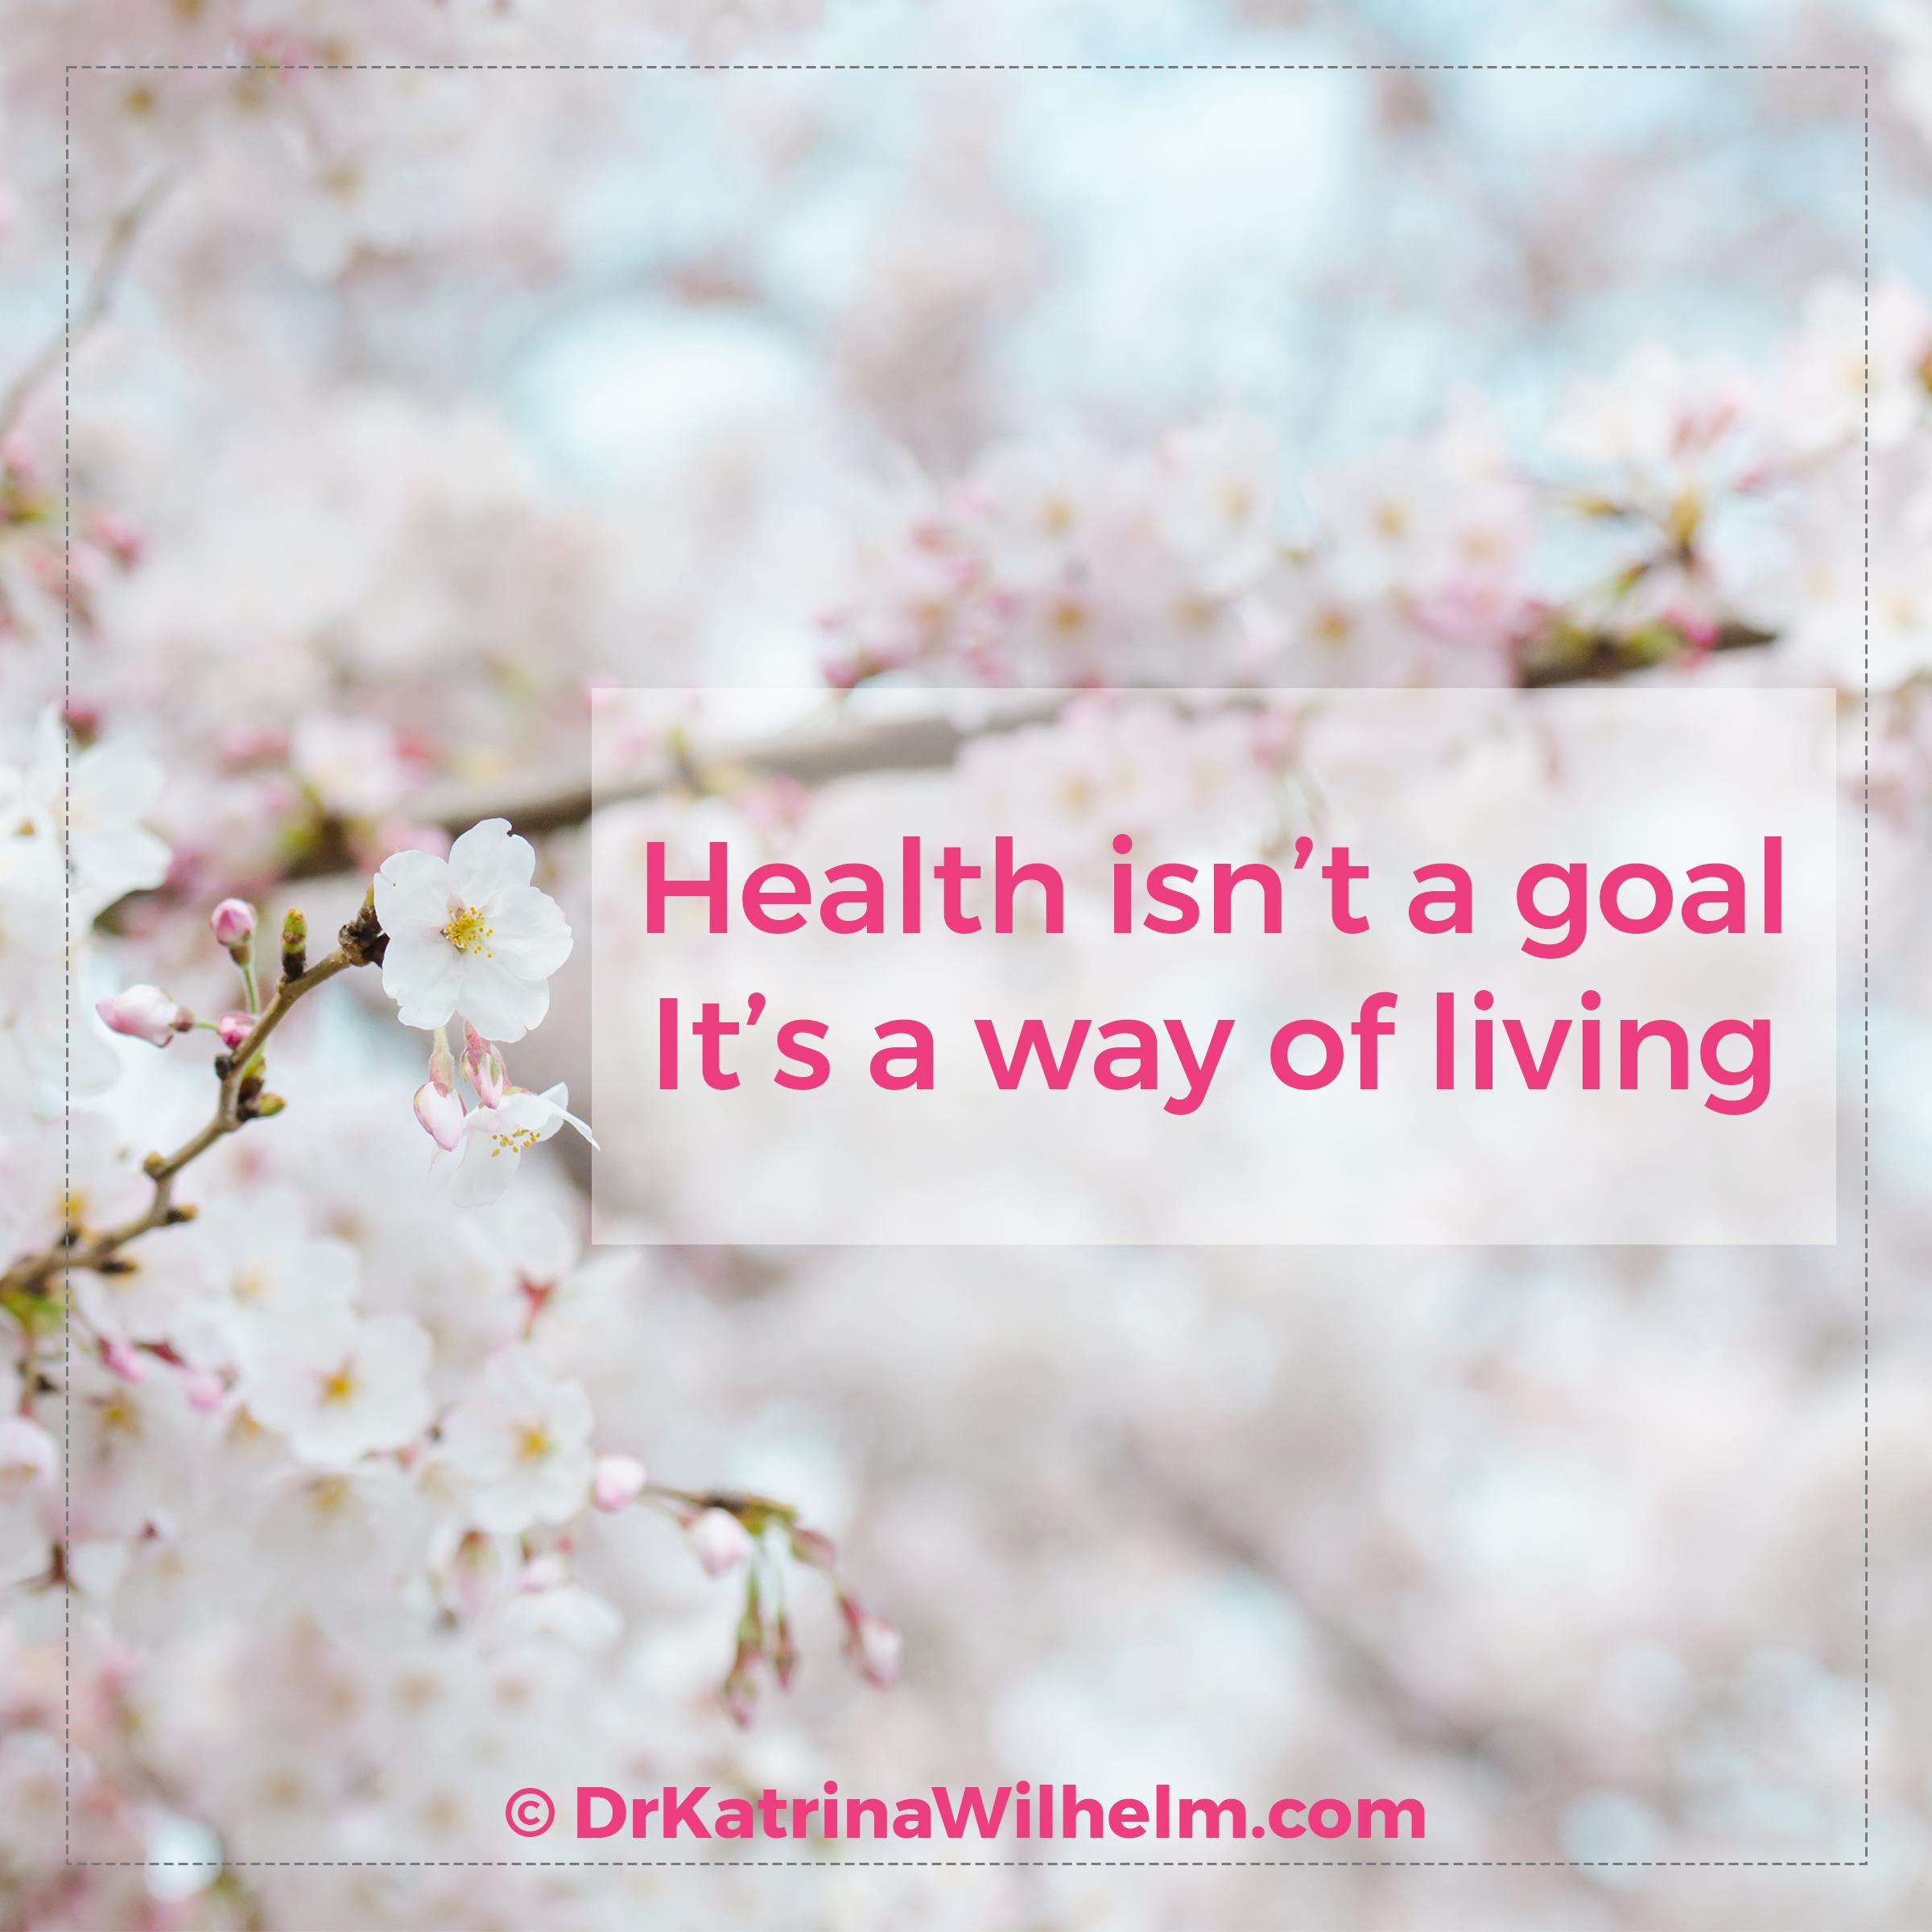 DKW healthy inspirational motivational quotes diet-3b.jpg